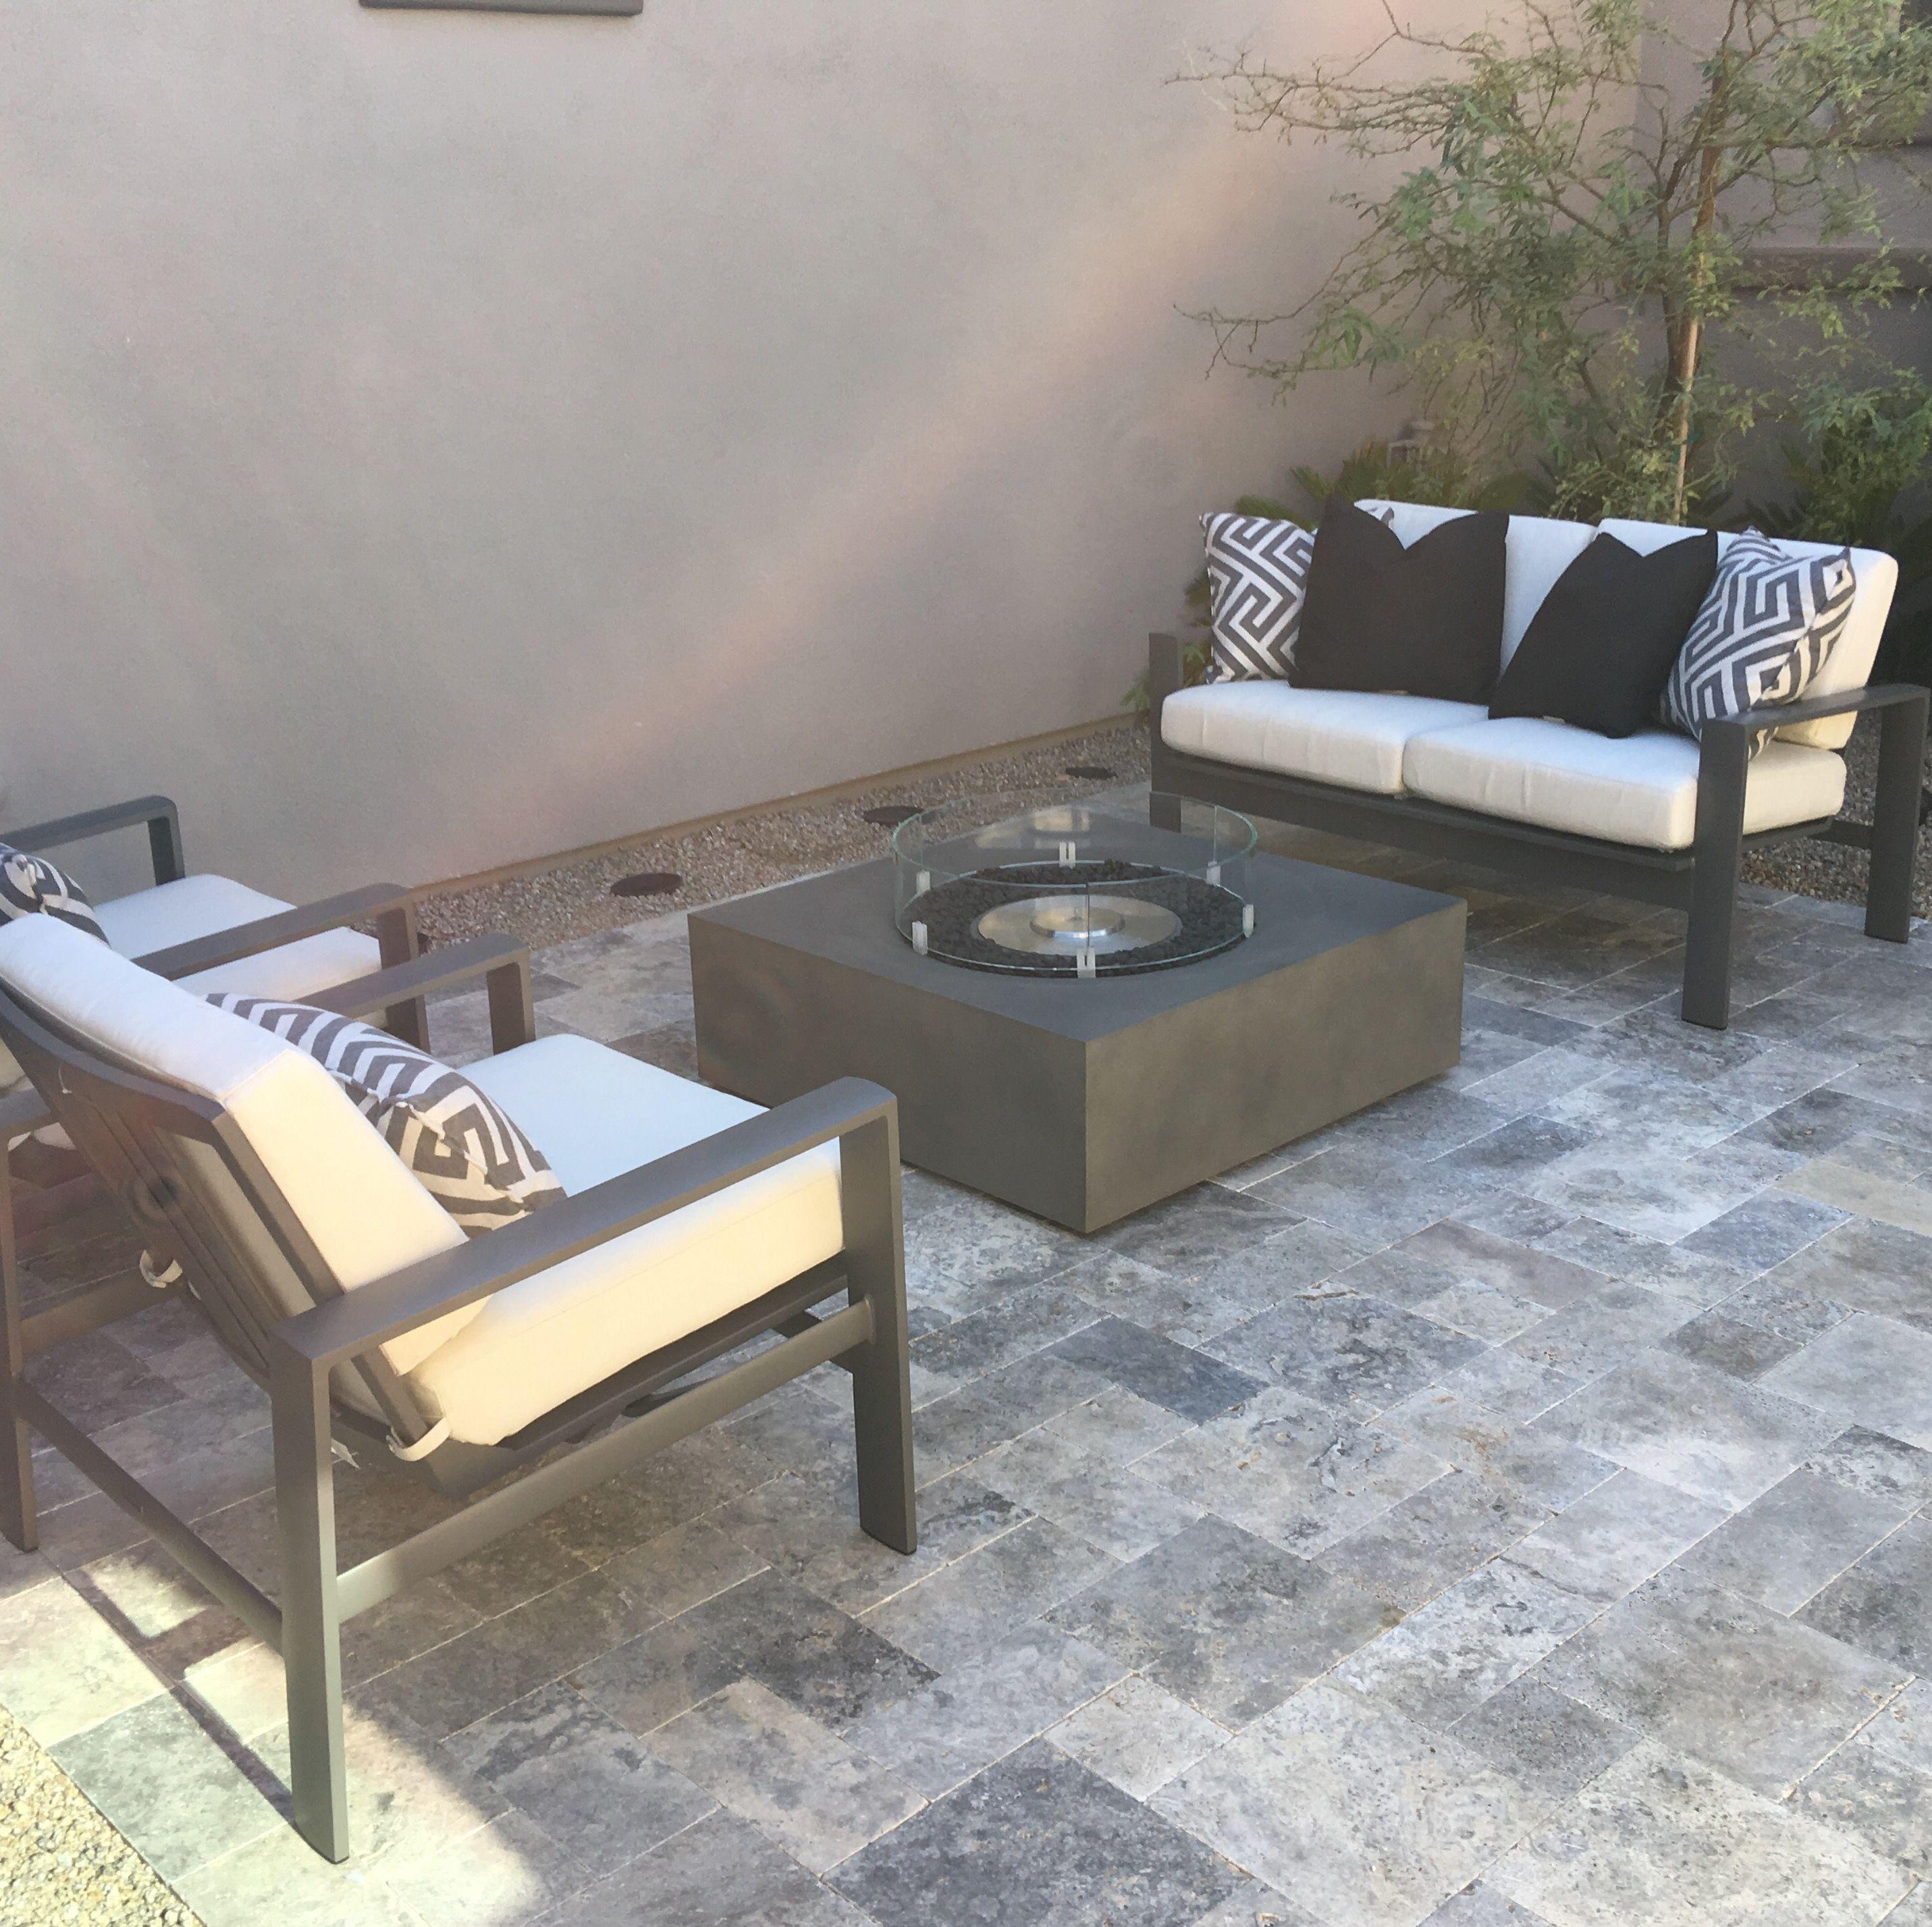 All American Outdoor Furniture Scottsdale Az: All American Outdoor Living Residential Project Fountain